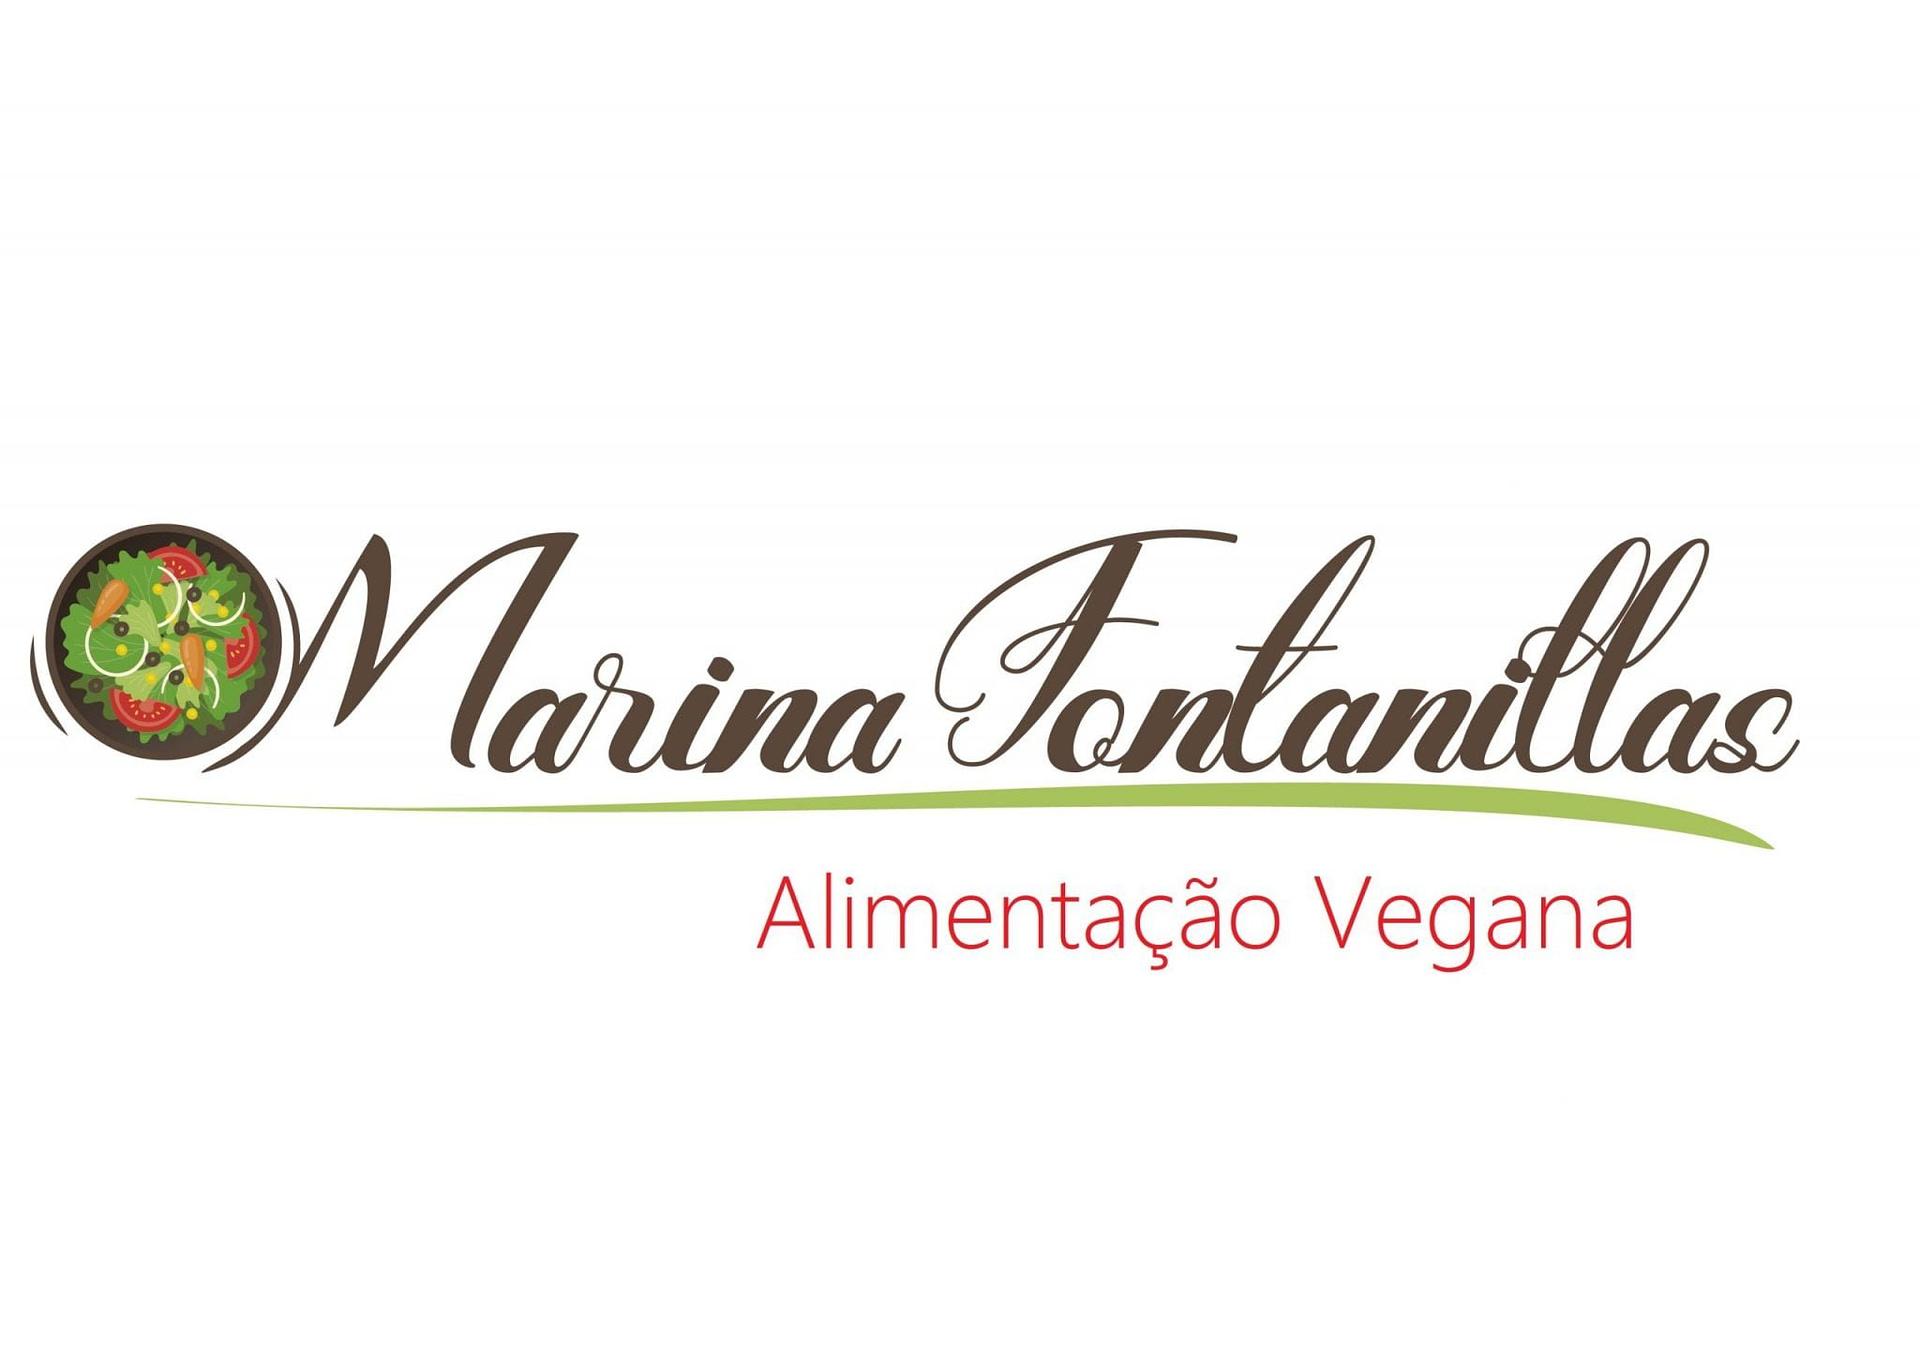 Marina Fontanillas - Alimentacão vegana